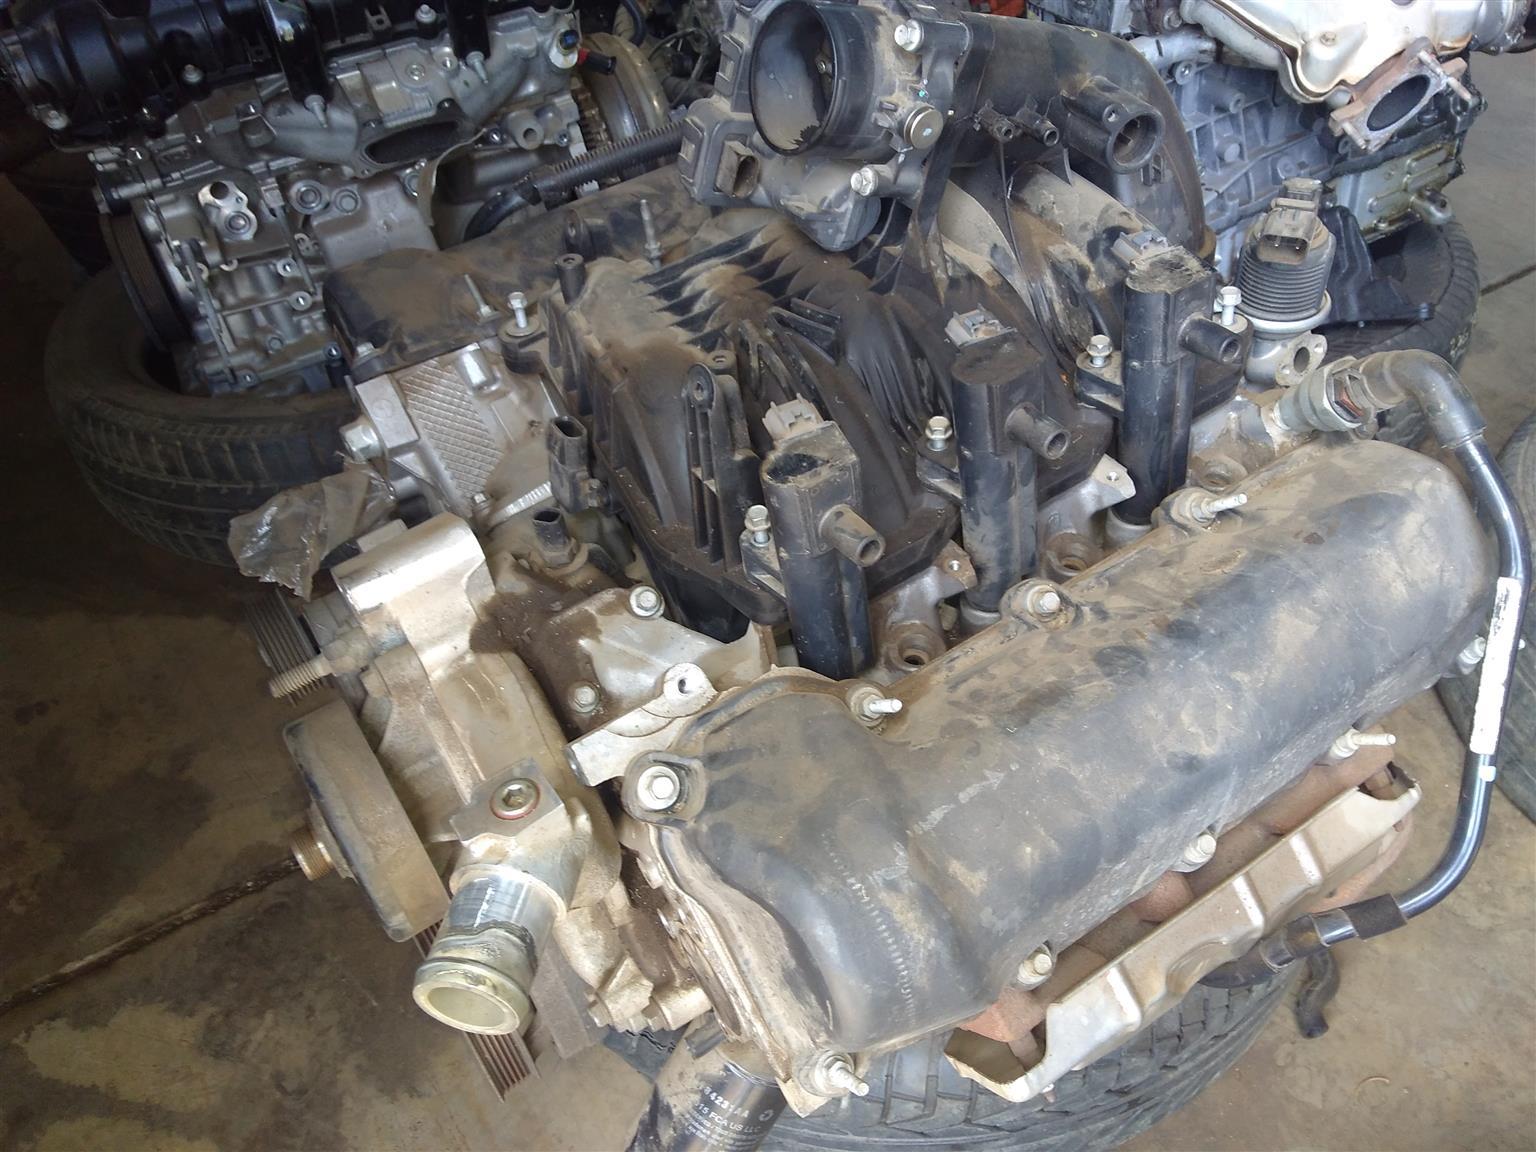 Jeep Wrangler 2.8 Diesel Engine